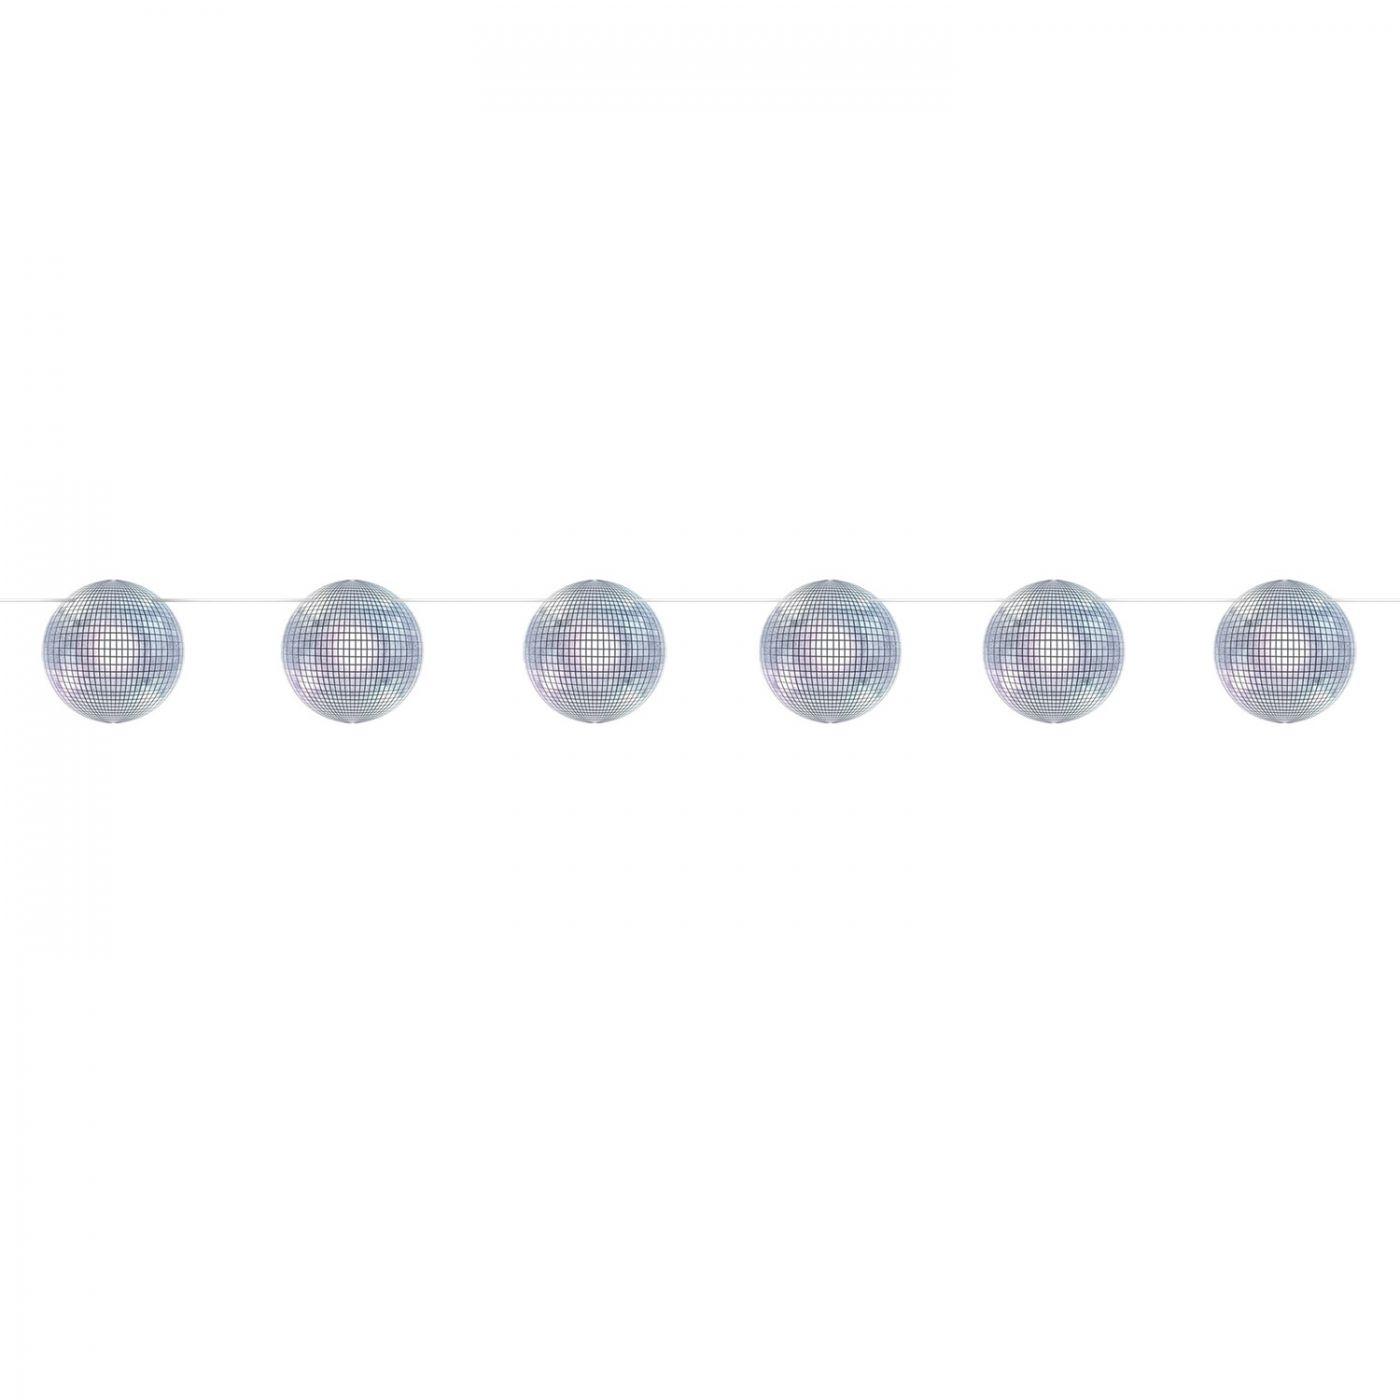 Disco Ball Streamer image